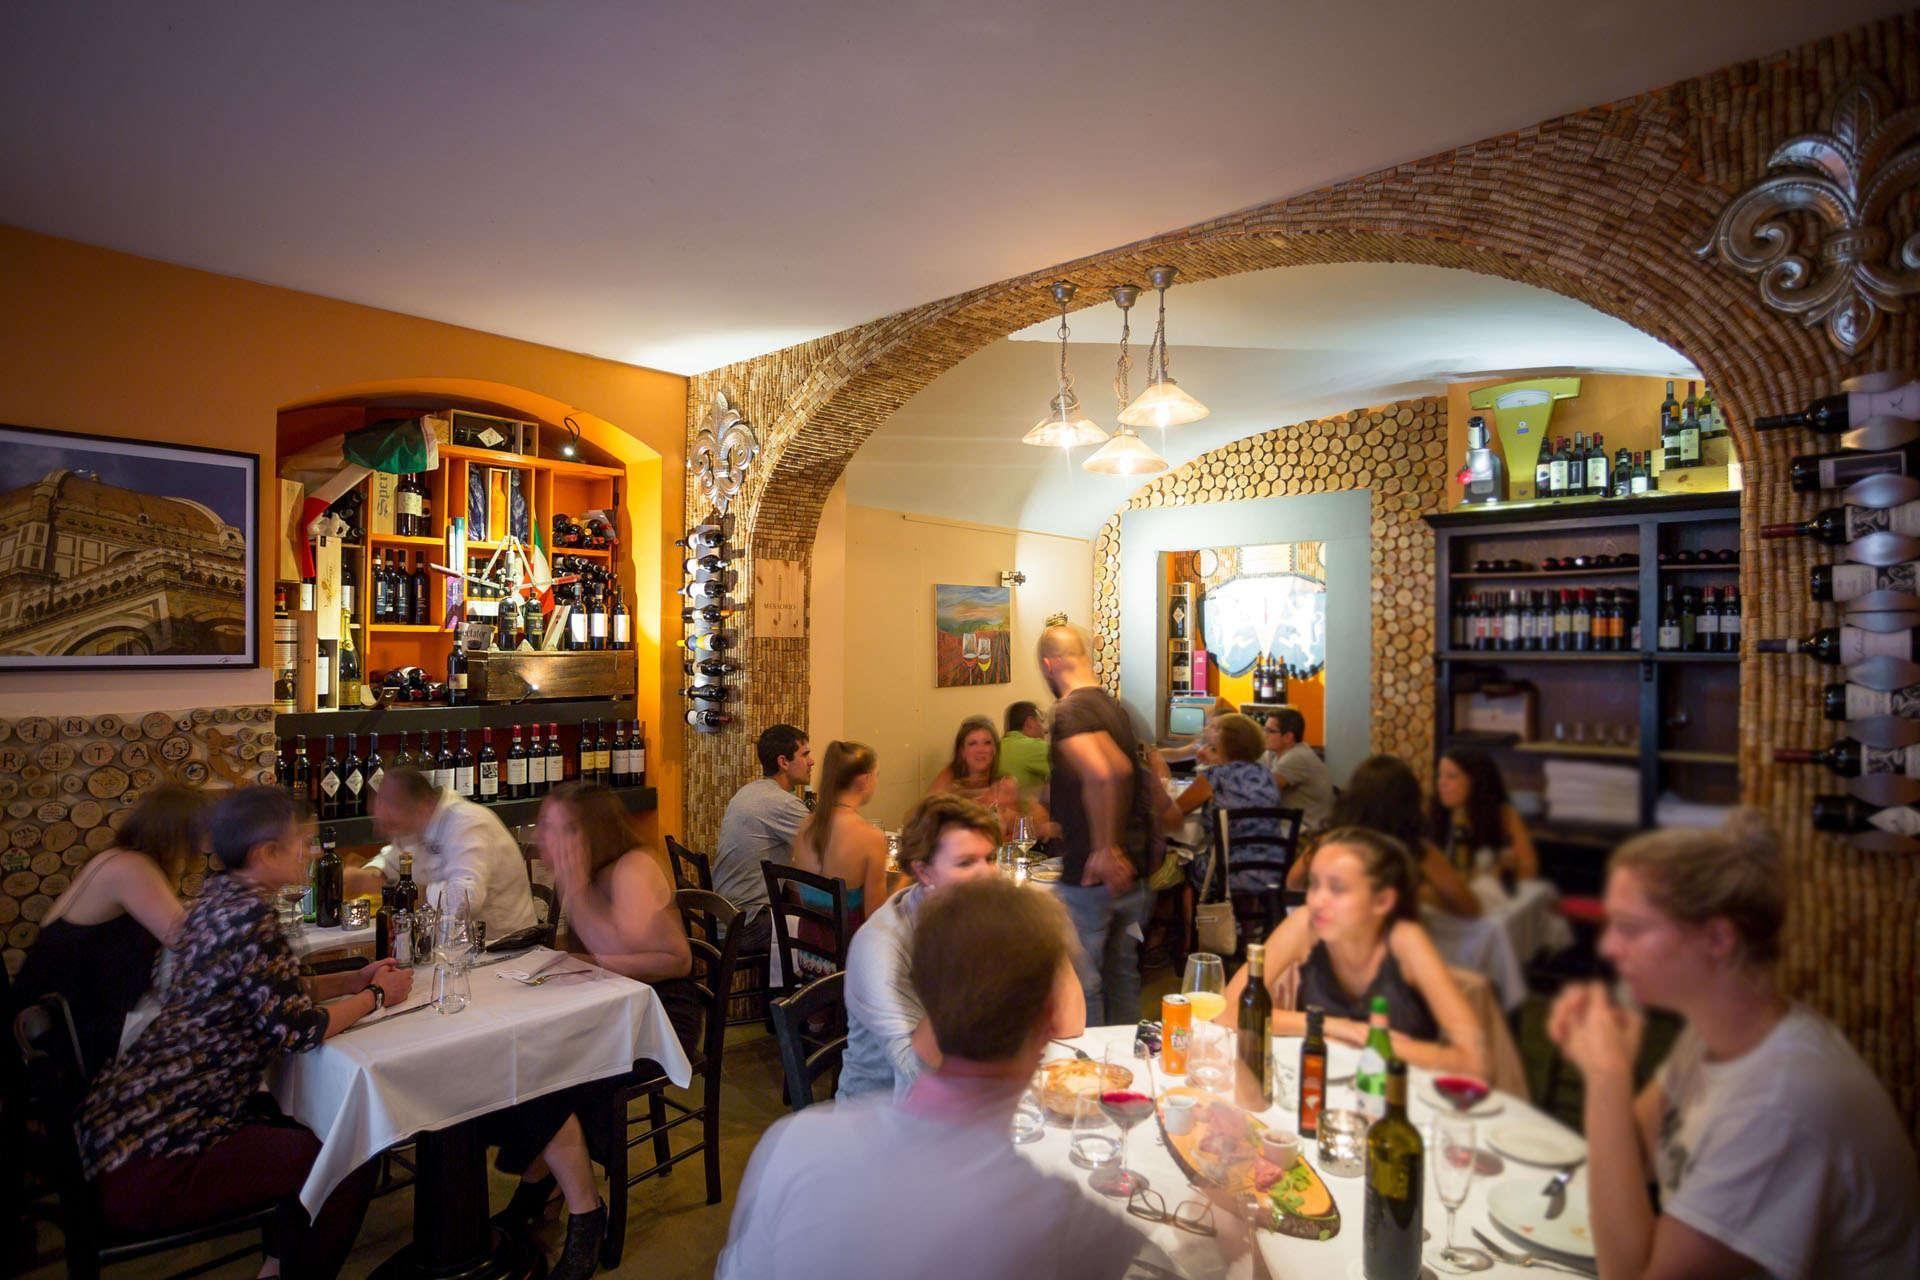 La Buchetta Food Wine Typical Romantic Restaurant In Florence Romantic Restaurant Restaurant Florence City